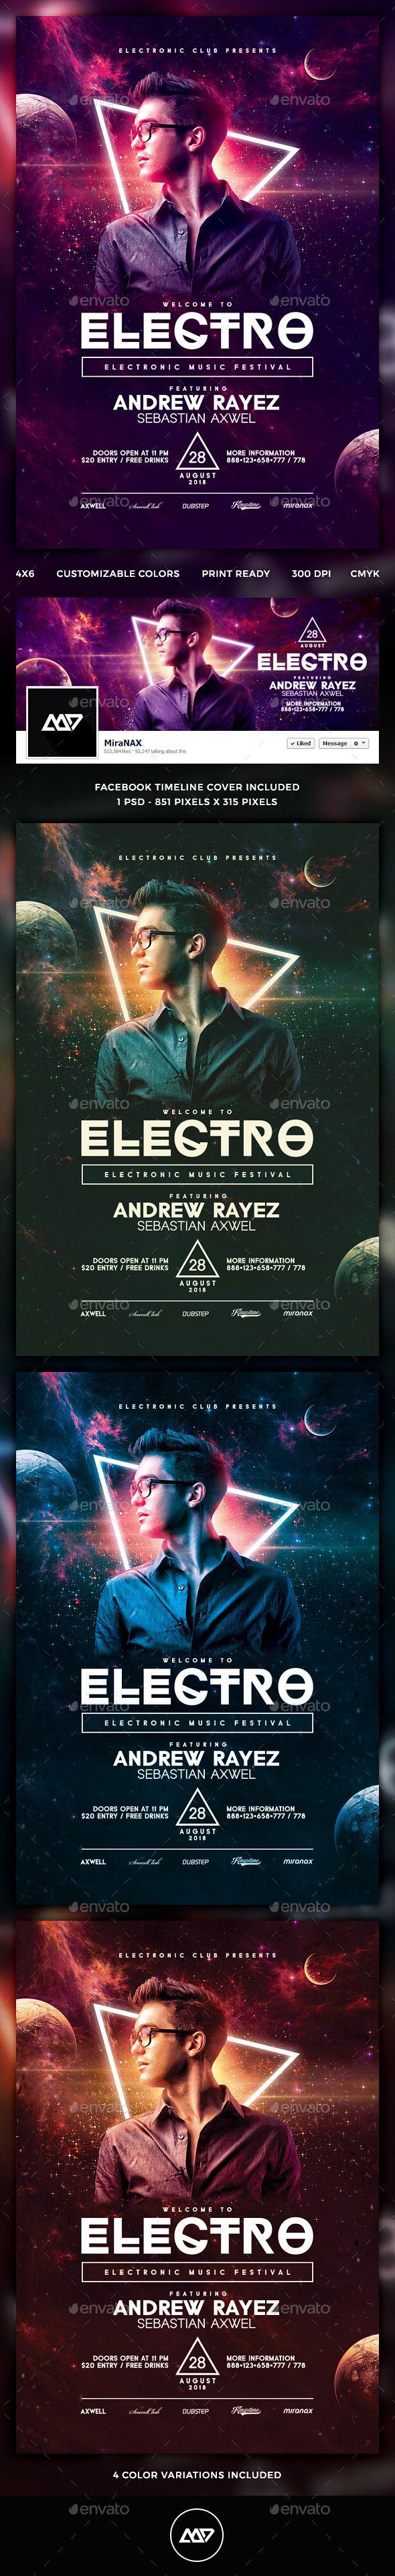 Electro Flyer #concert #dance #disco #dj #dj flyer #$6